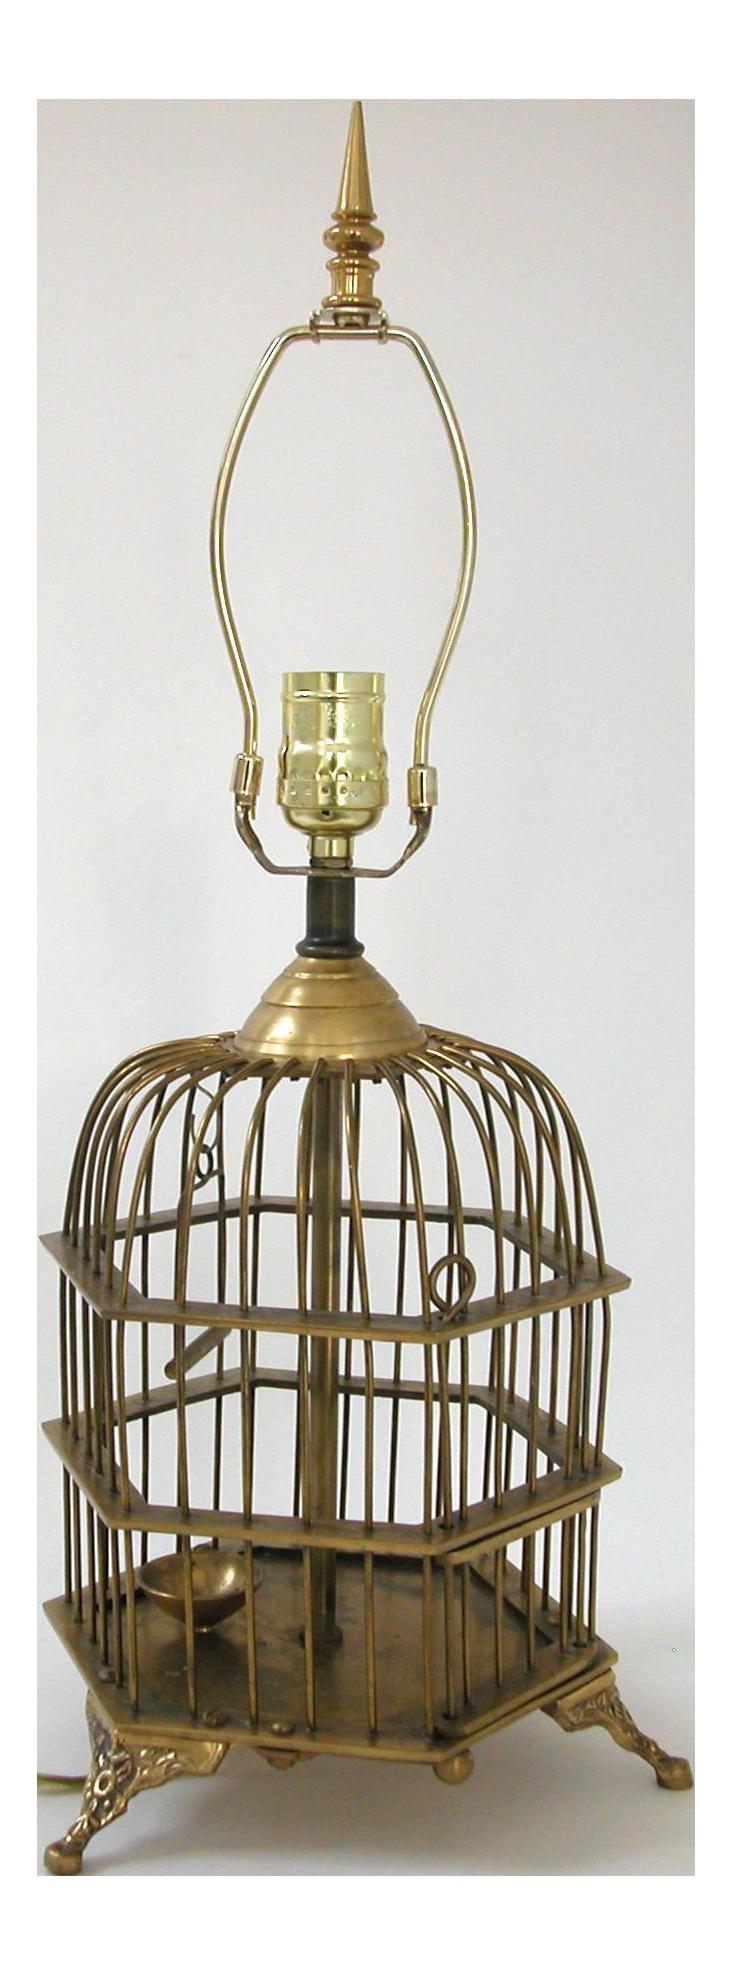 shade cage vintage bird lampshade lamp design birdcage munchkin by creative ideas original